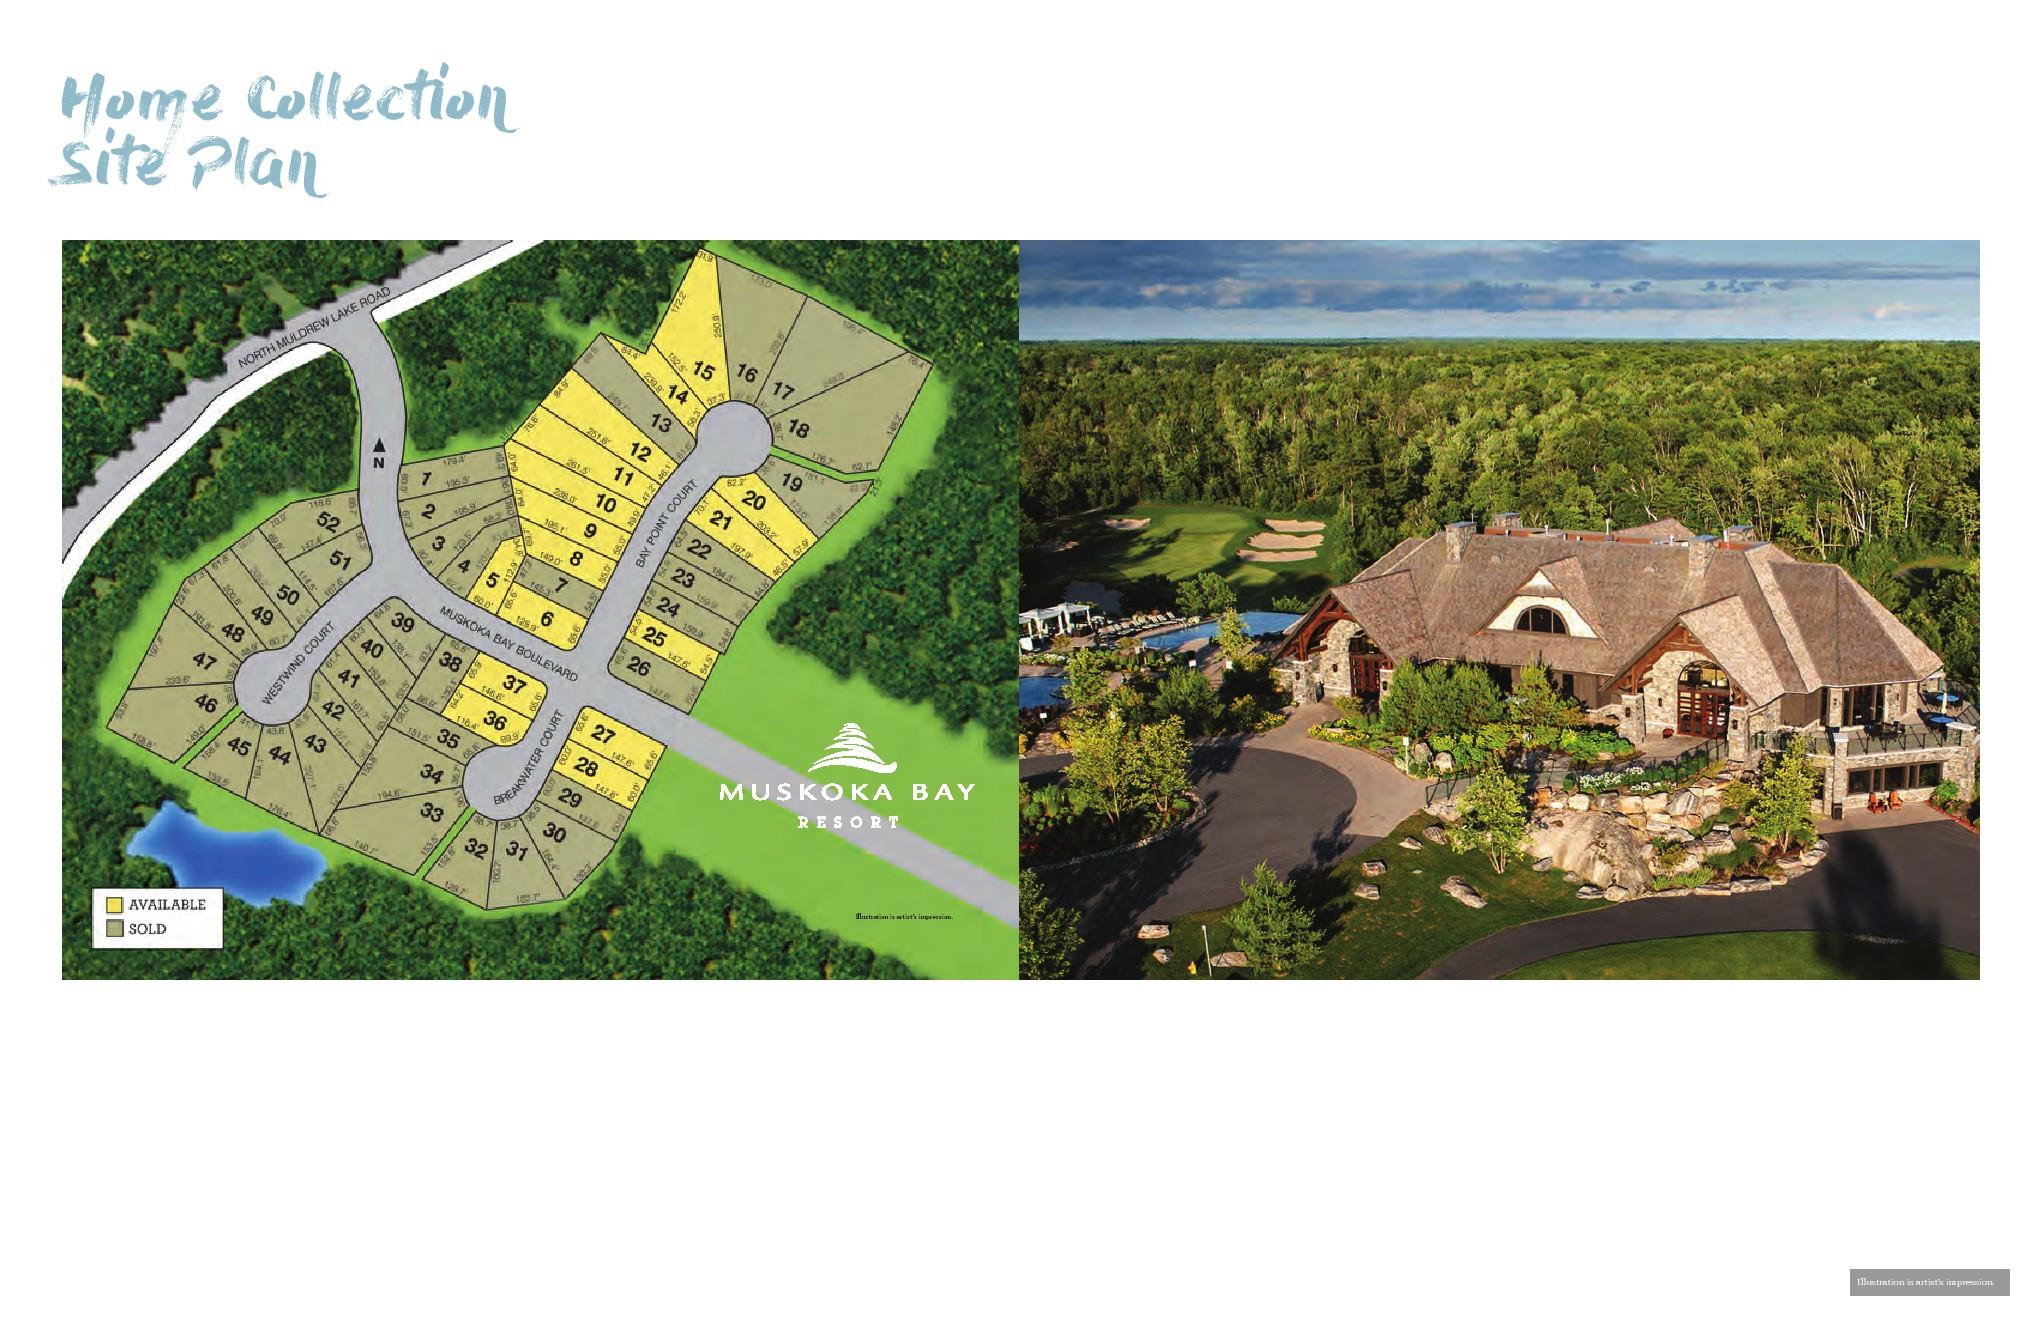 Muskoka Bay Resort